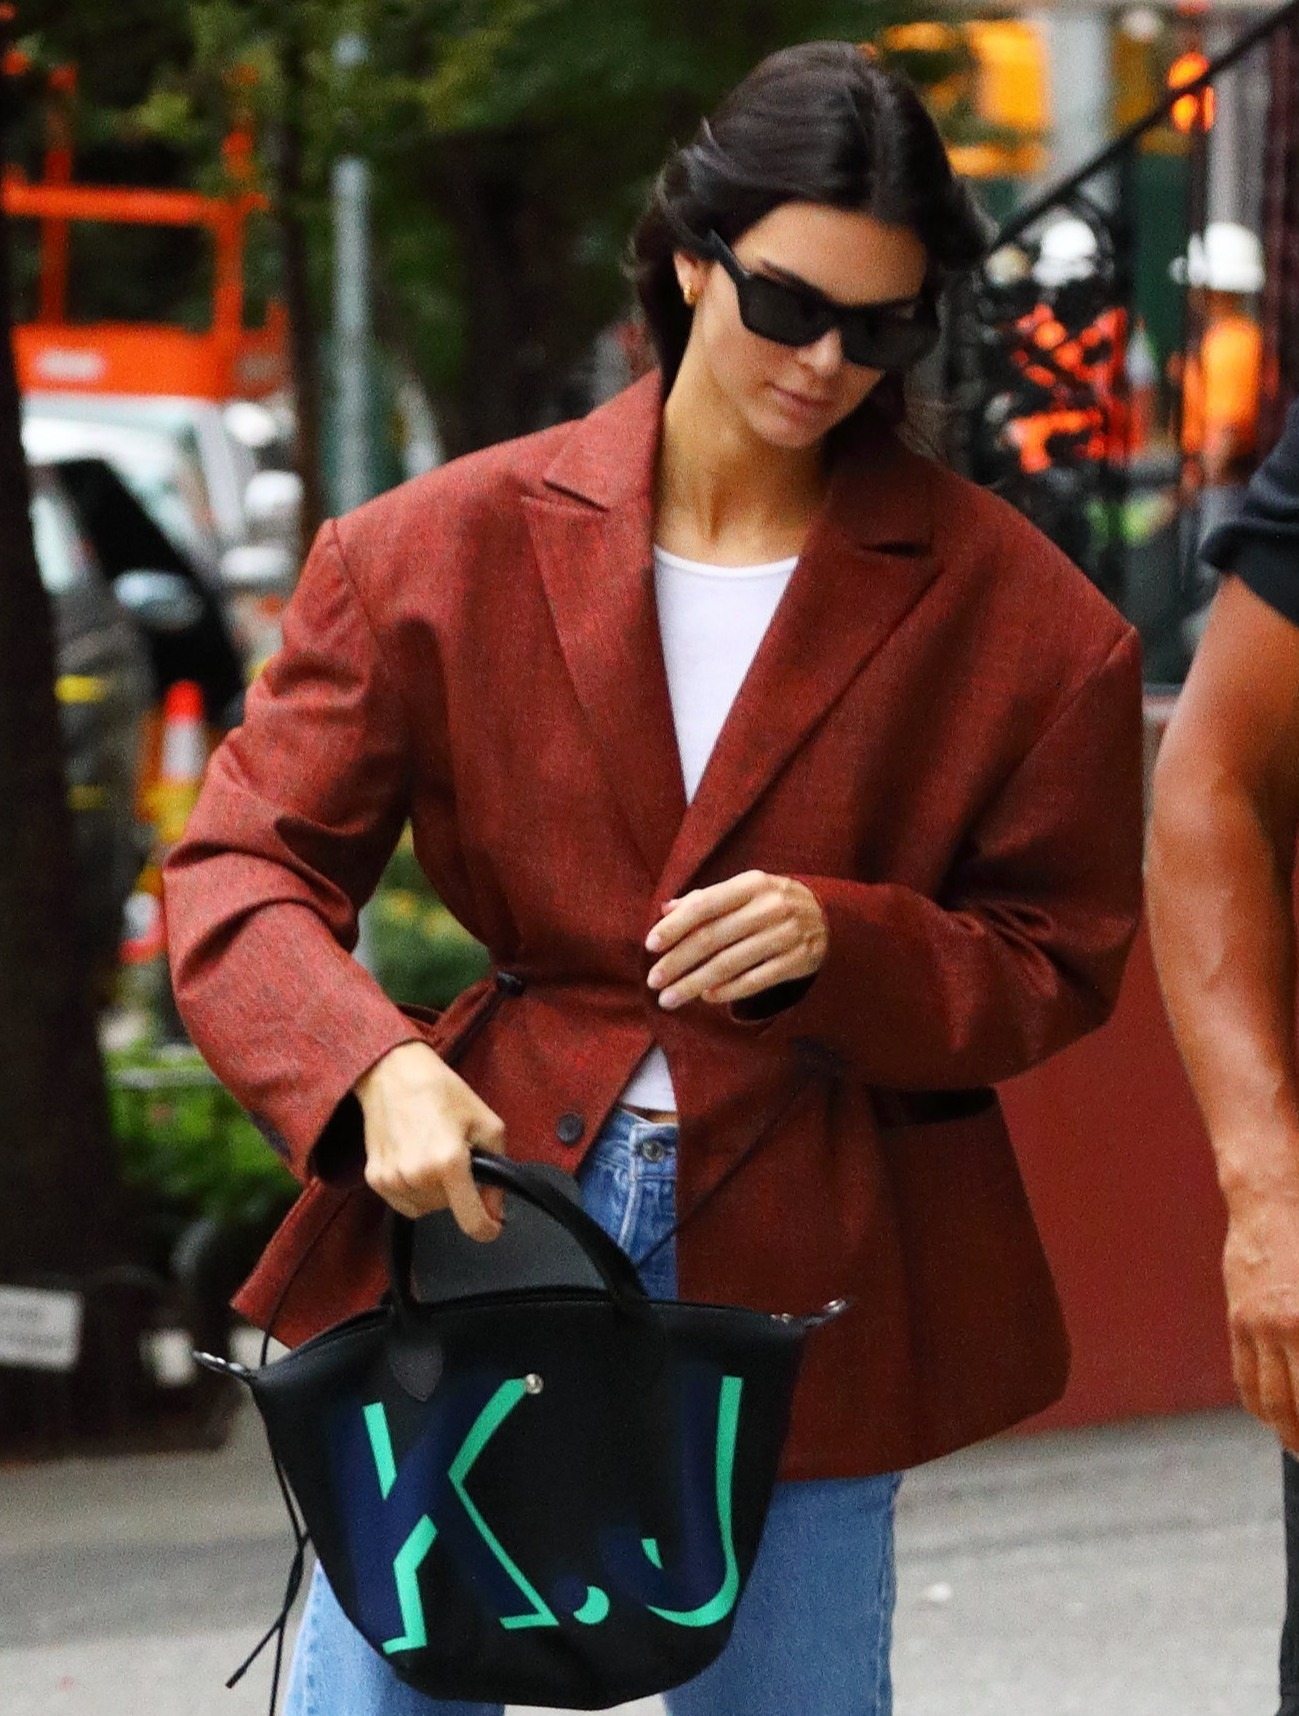 Poll: όλοι θέλουν την Kendall Jenner ξανθιά! Εσύ;